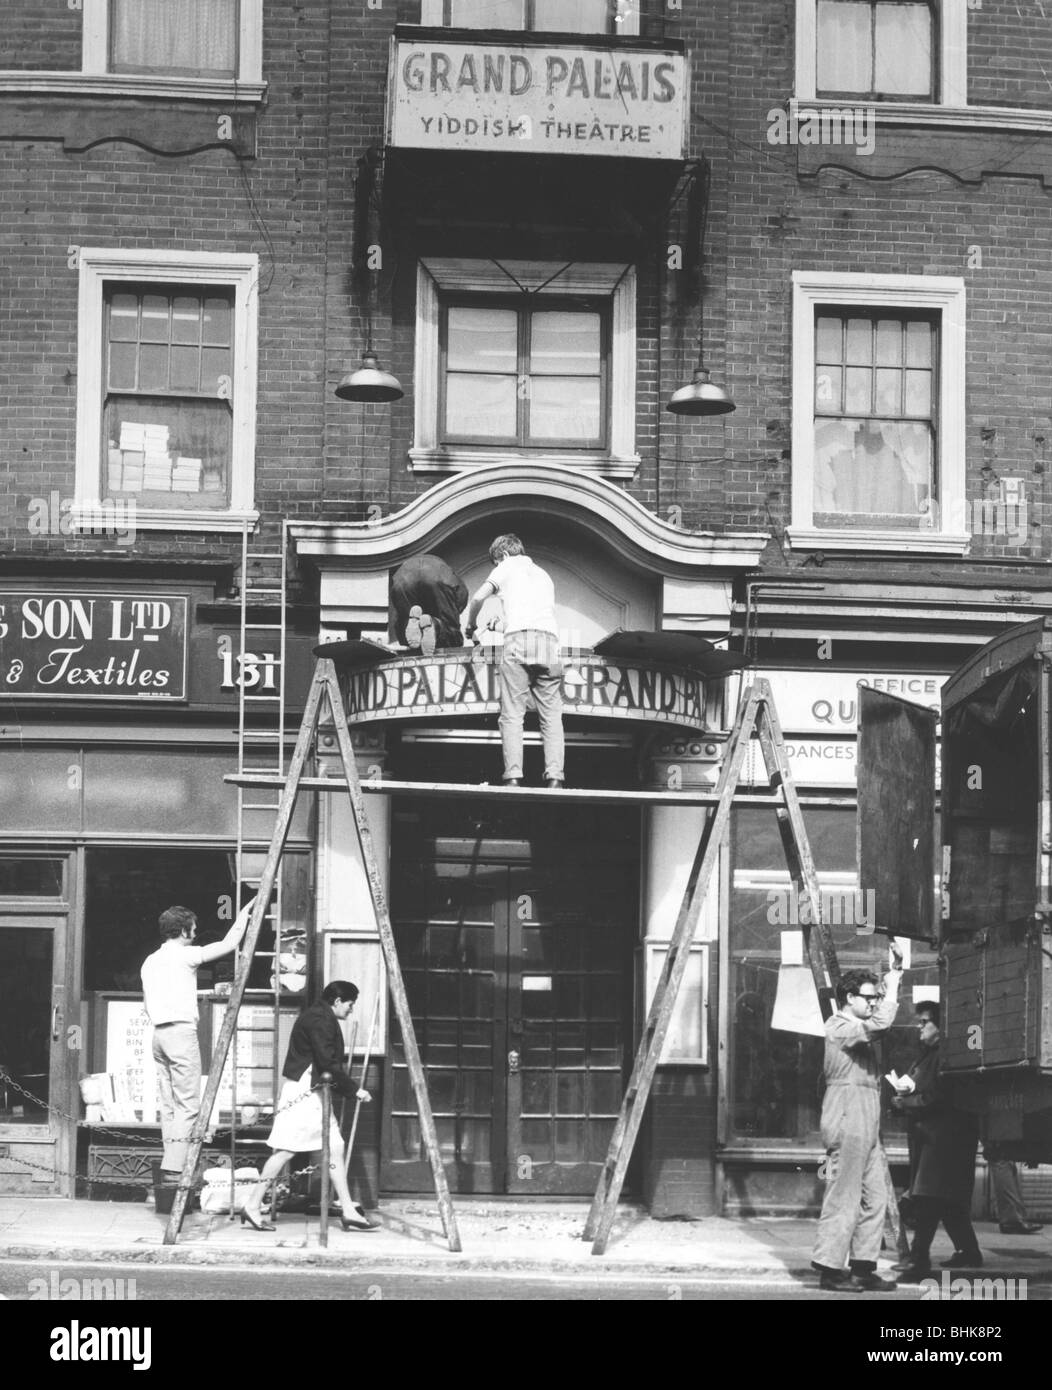 Closure of the Grand Palais Yiddish theatre, London, October 1970. - Stock Image